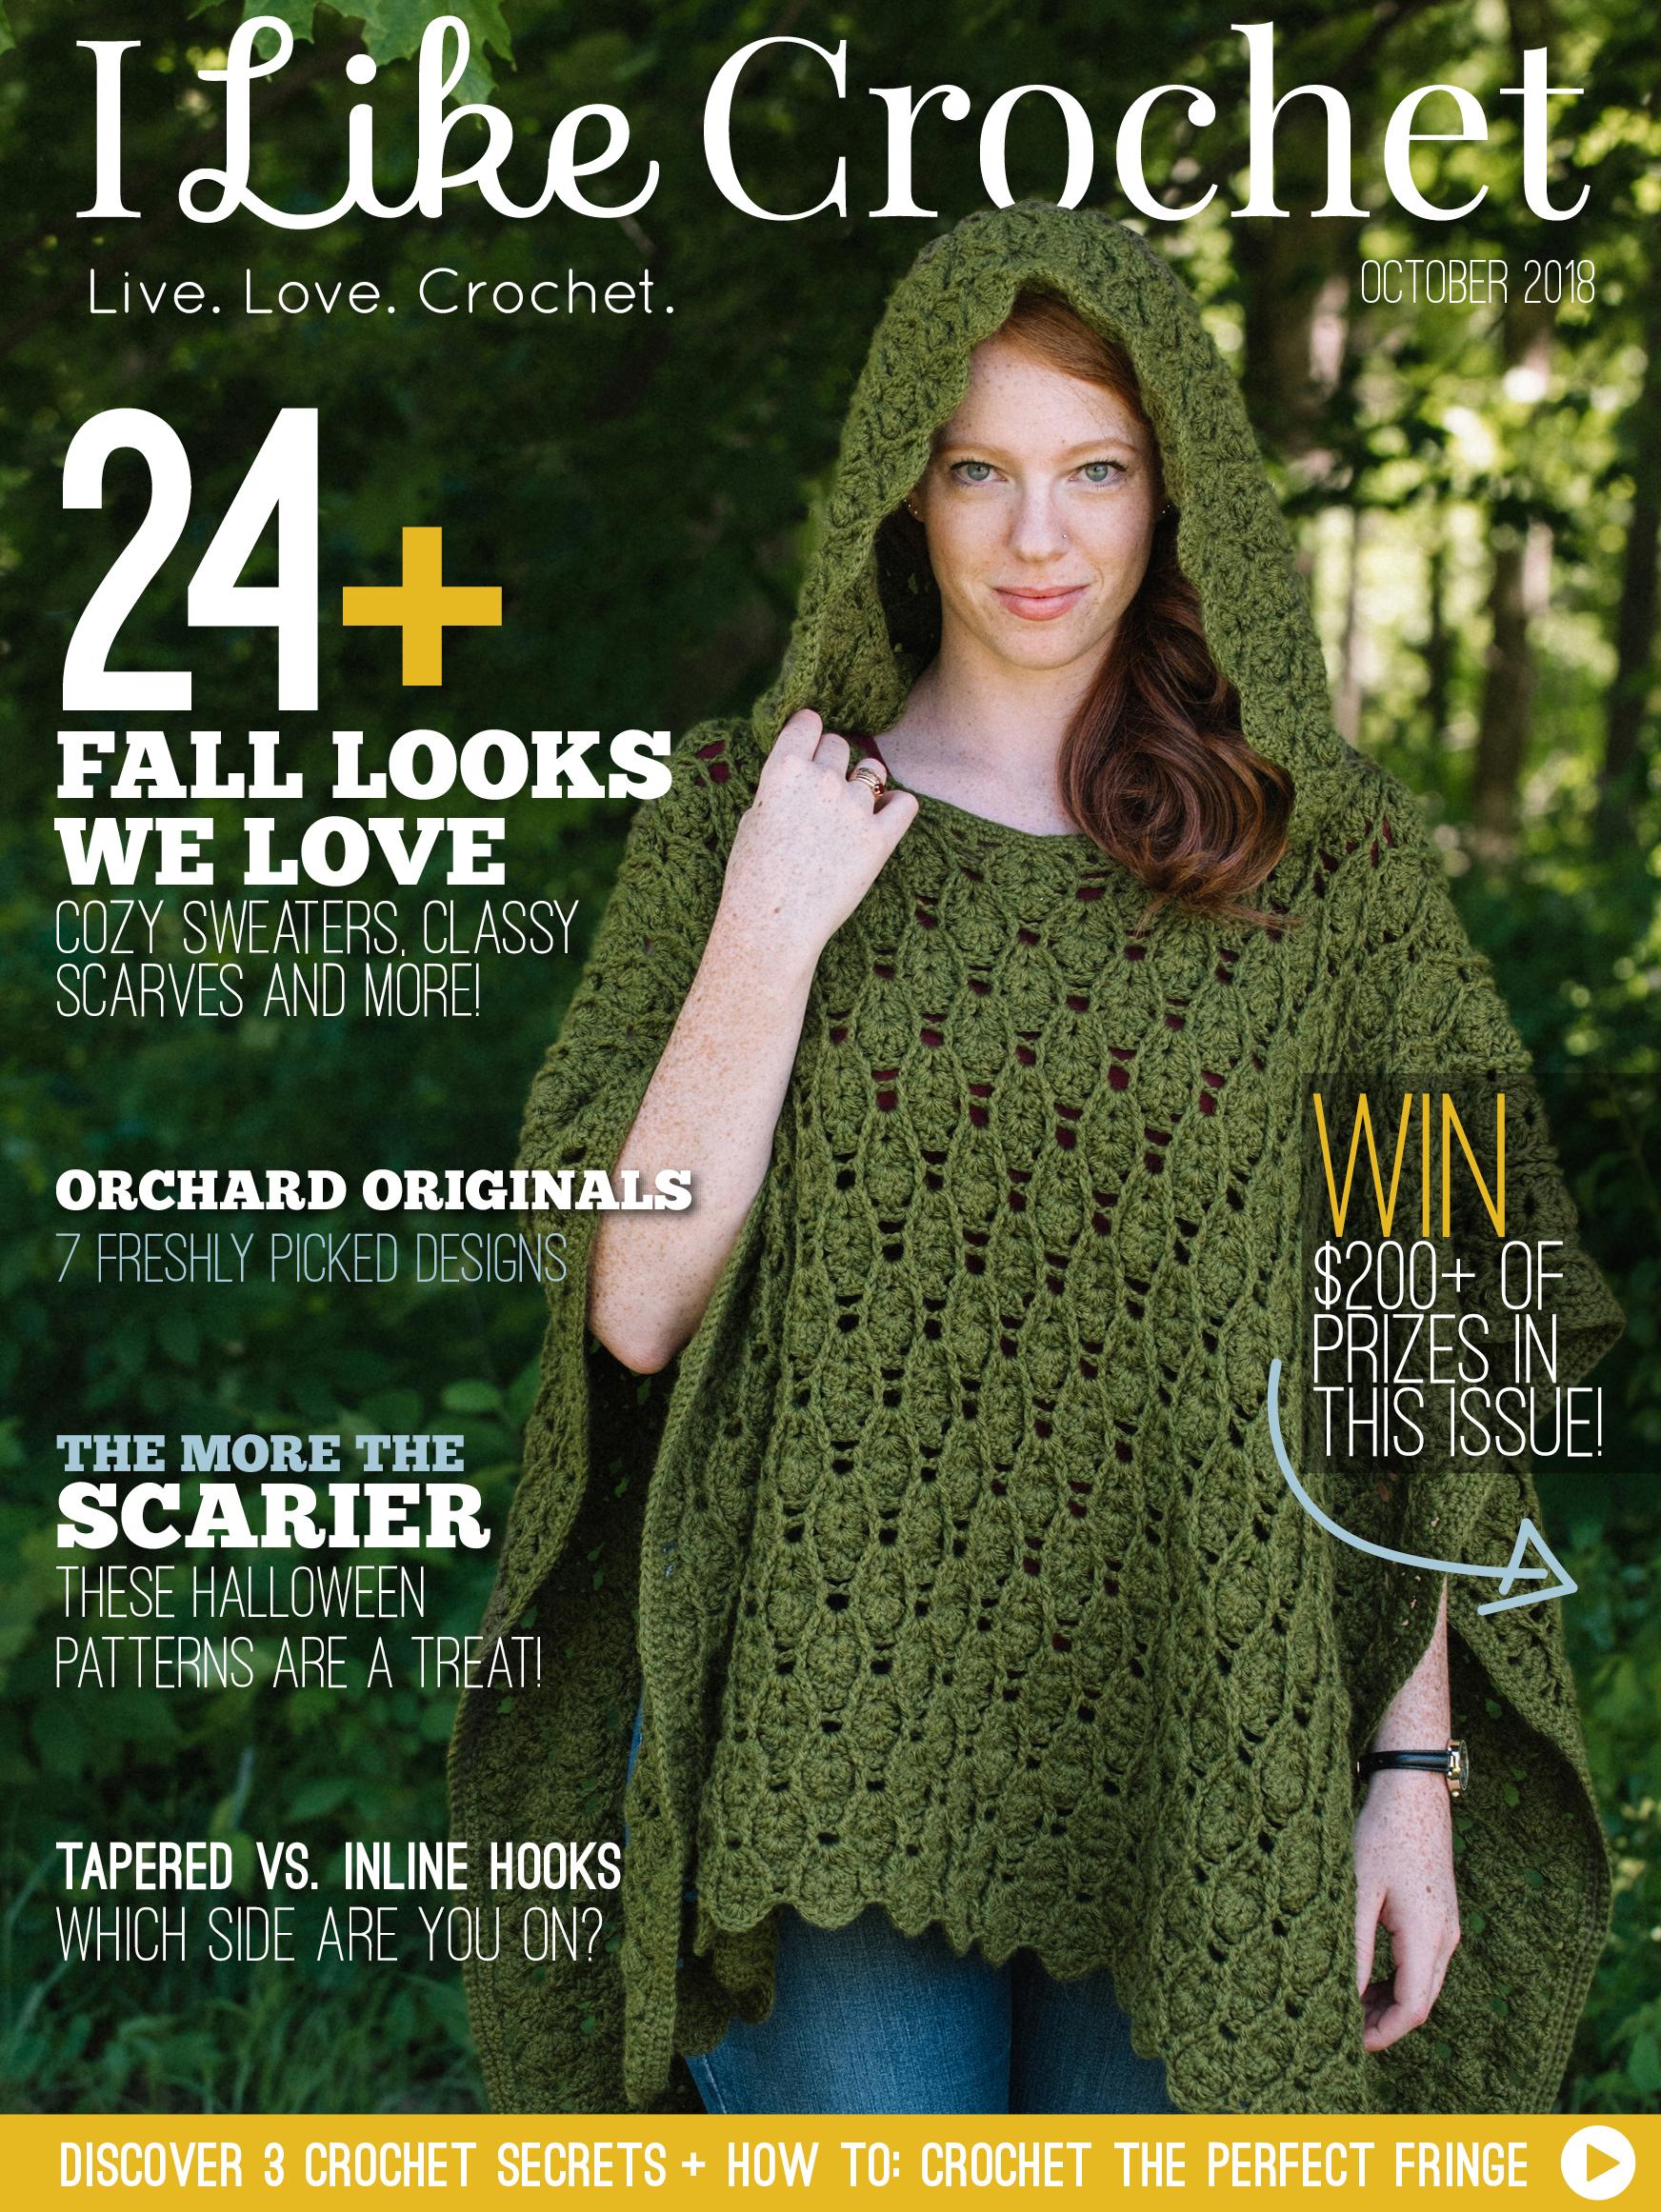 ILC-October 2018-cover